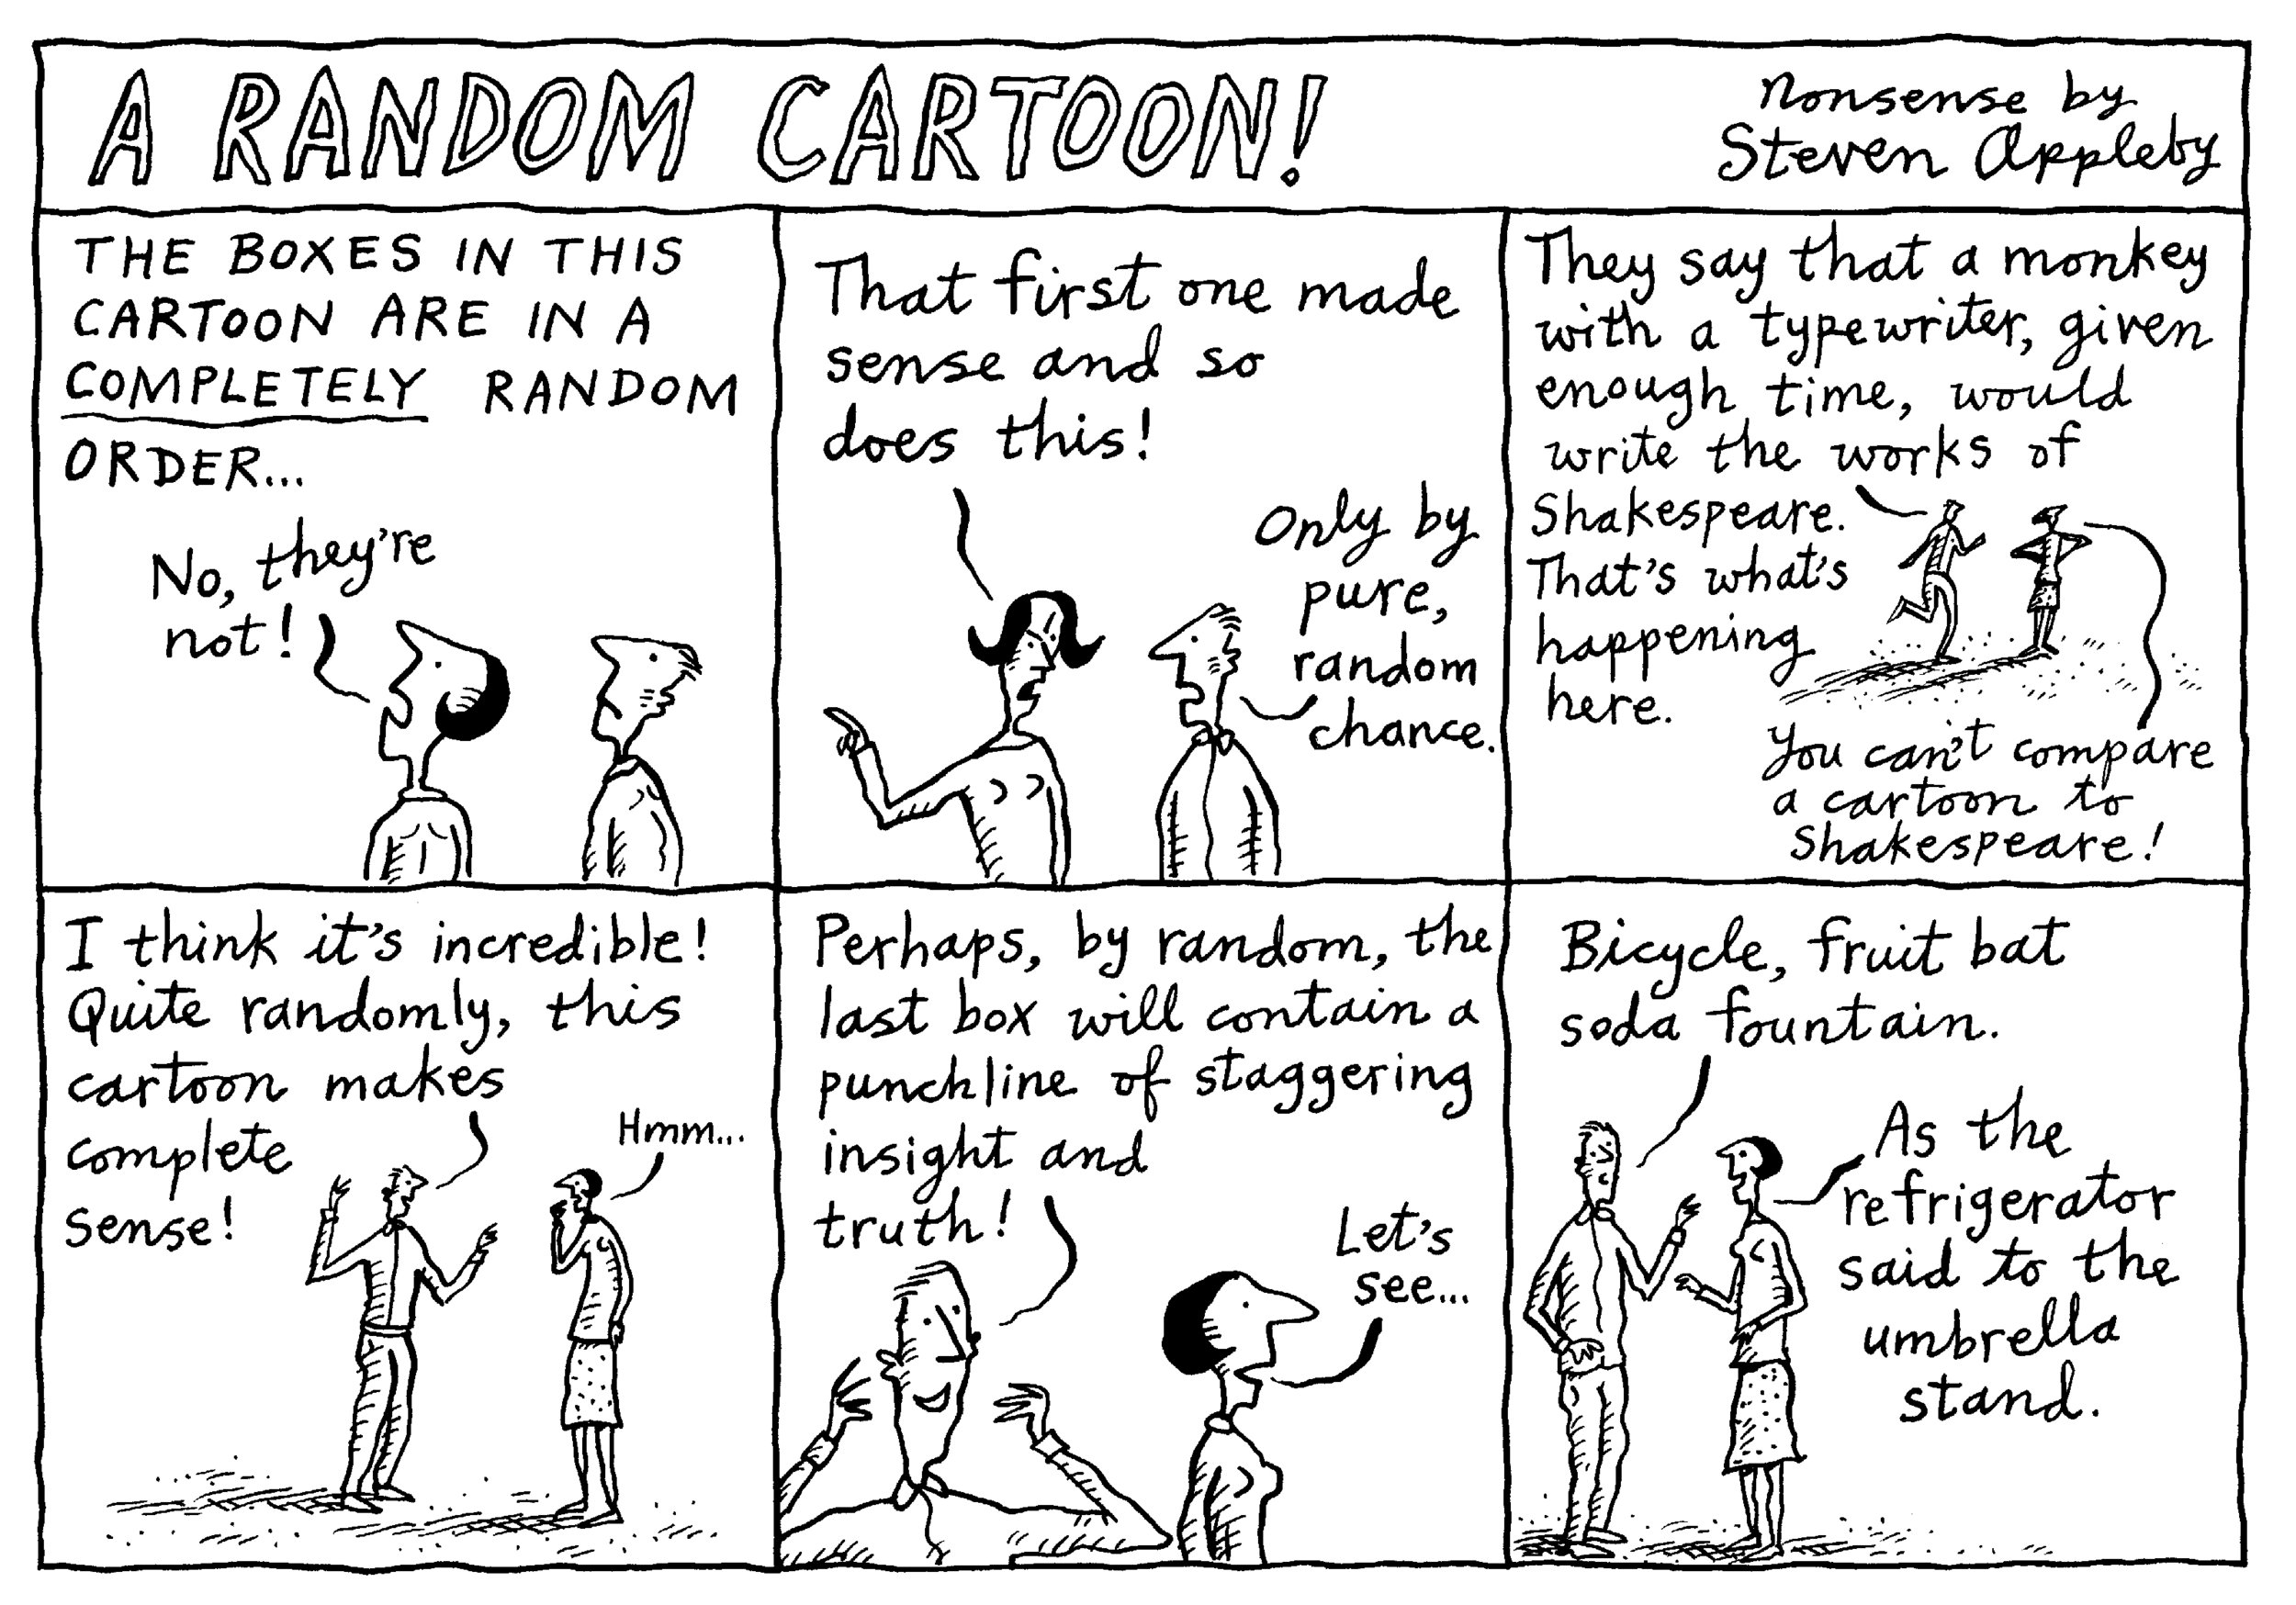 001 A Random Cartoon.jpg